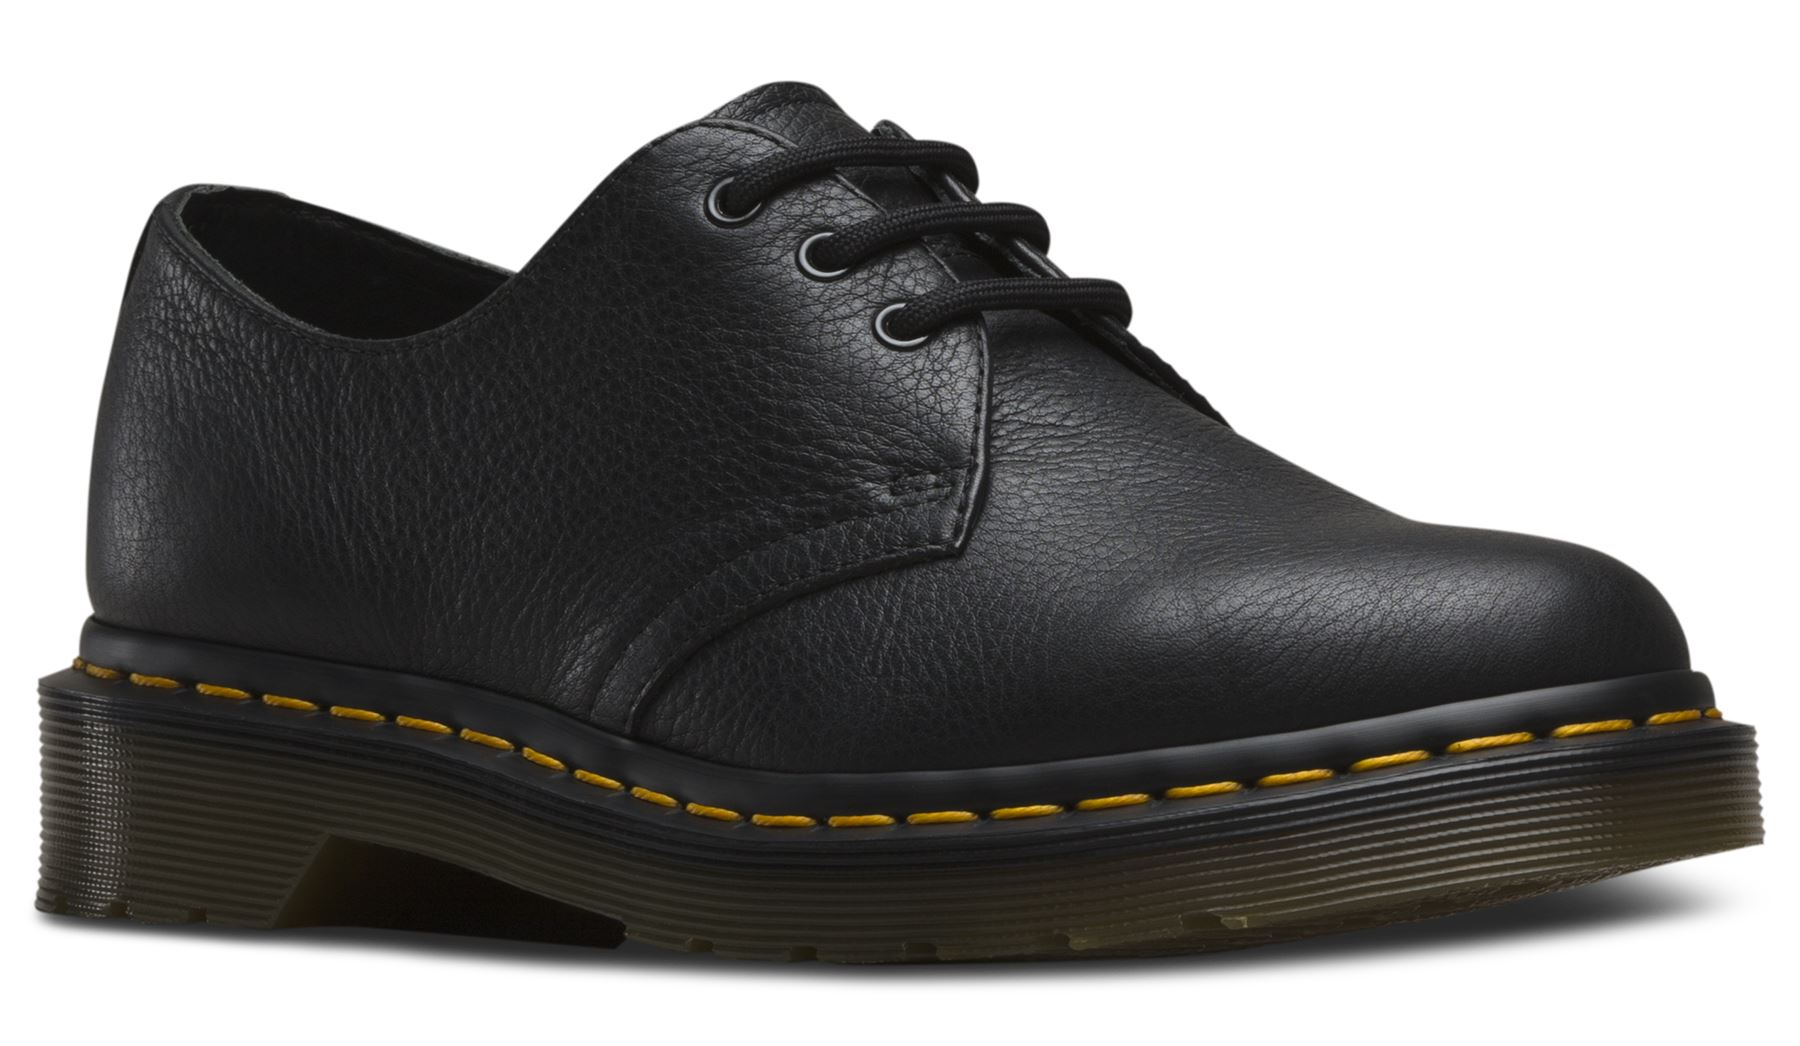 dr martens ladies 1461 virginia soft nappa leather 3 eye shoes ebay. Black Bedroom Furniture Sets. Home Design Ideas